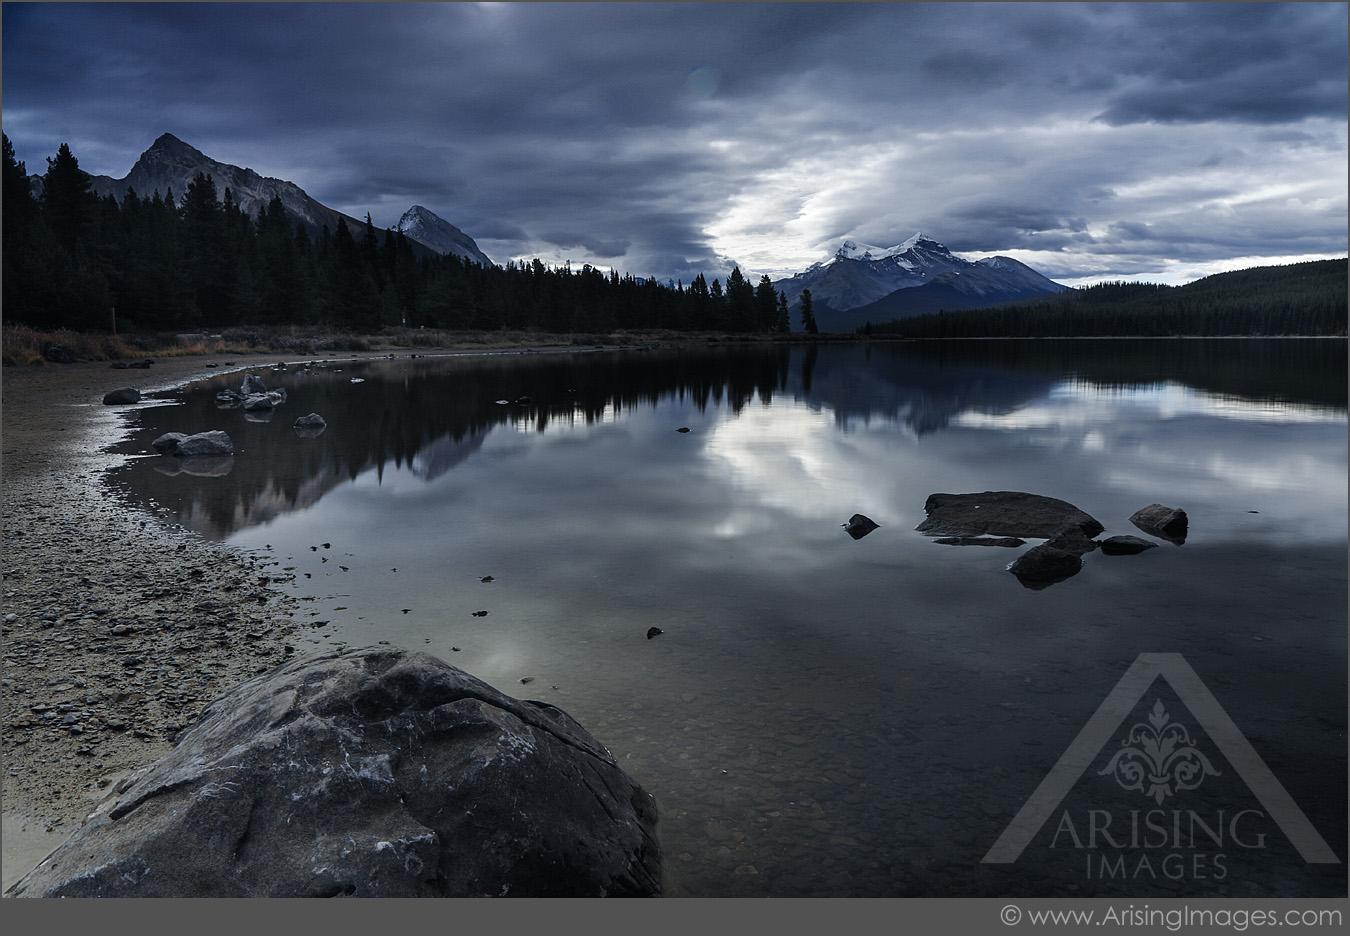 Maligne Lake Reflection, Jasper National Park